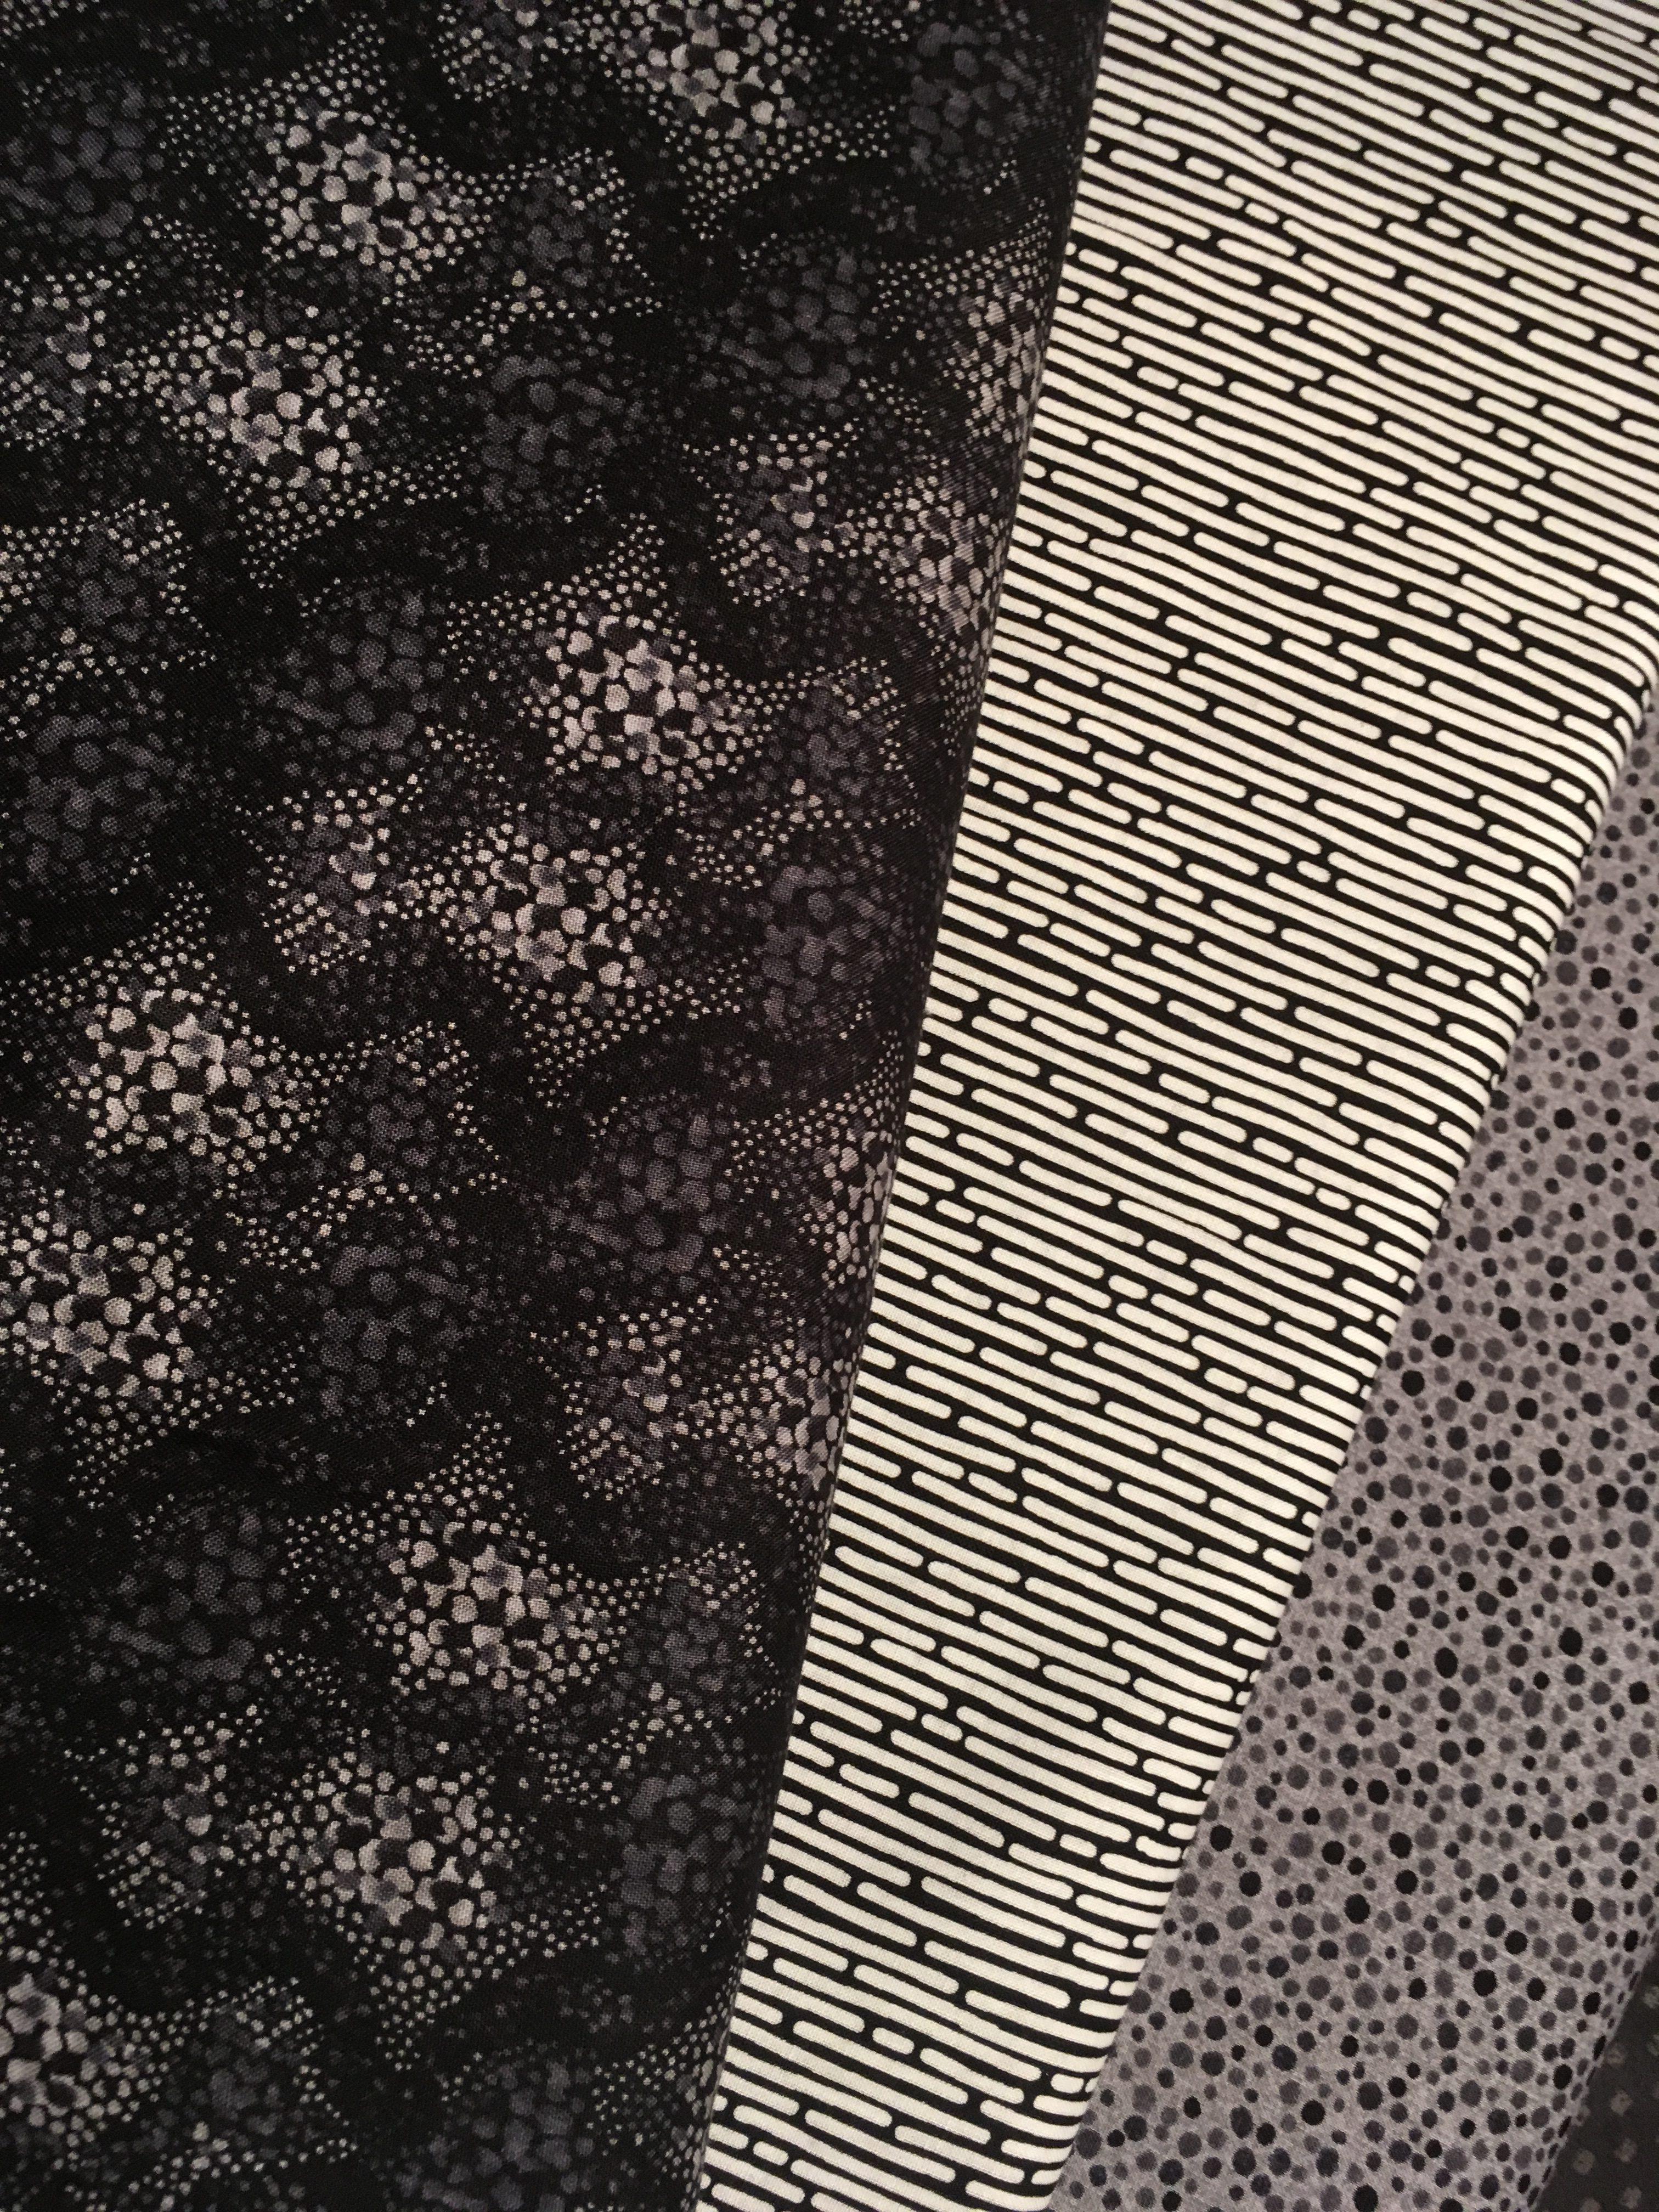 grau/schwarz - Gris/noir